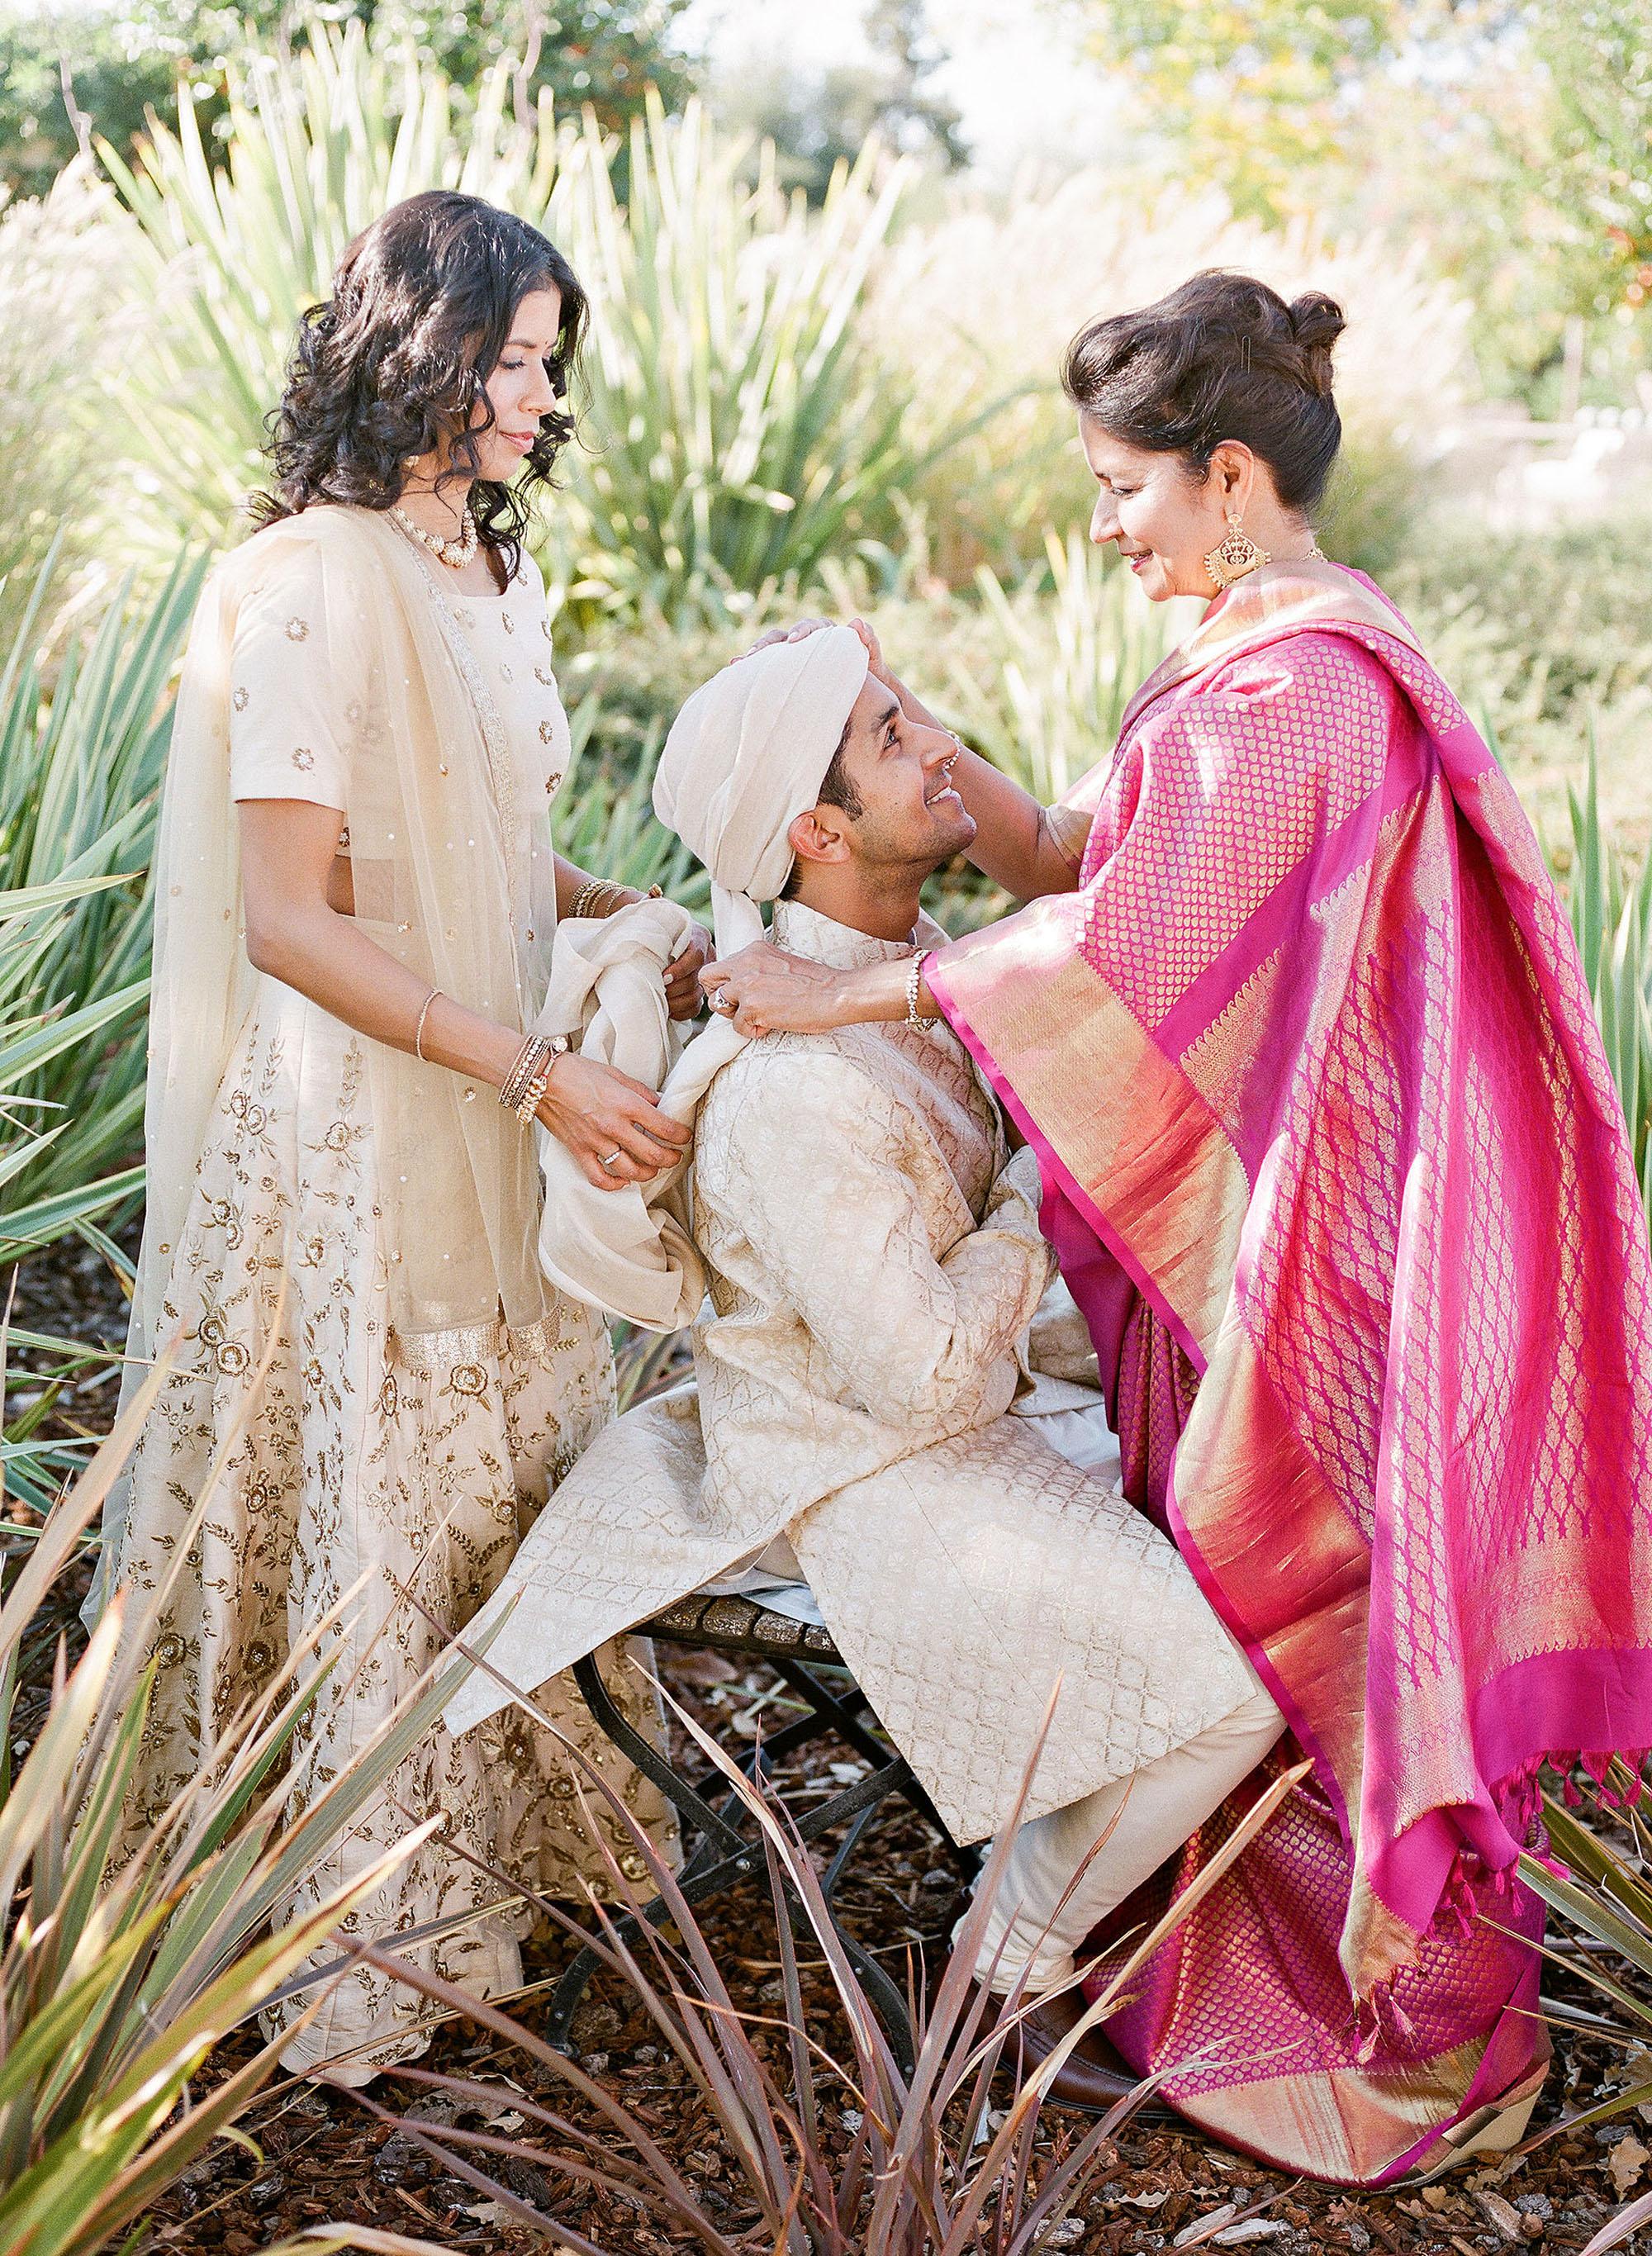 jenna alok wedding wine country california mother sister tying groom turban